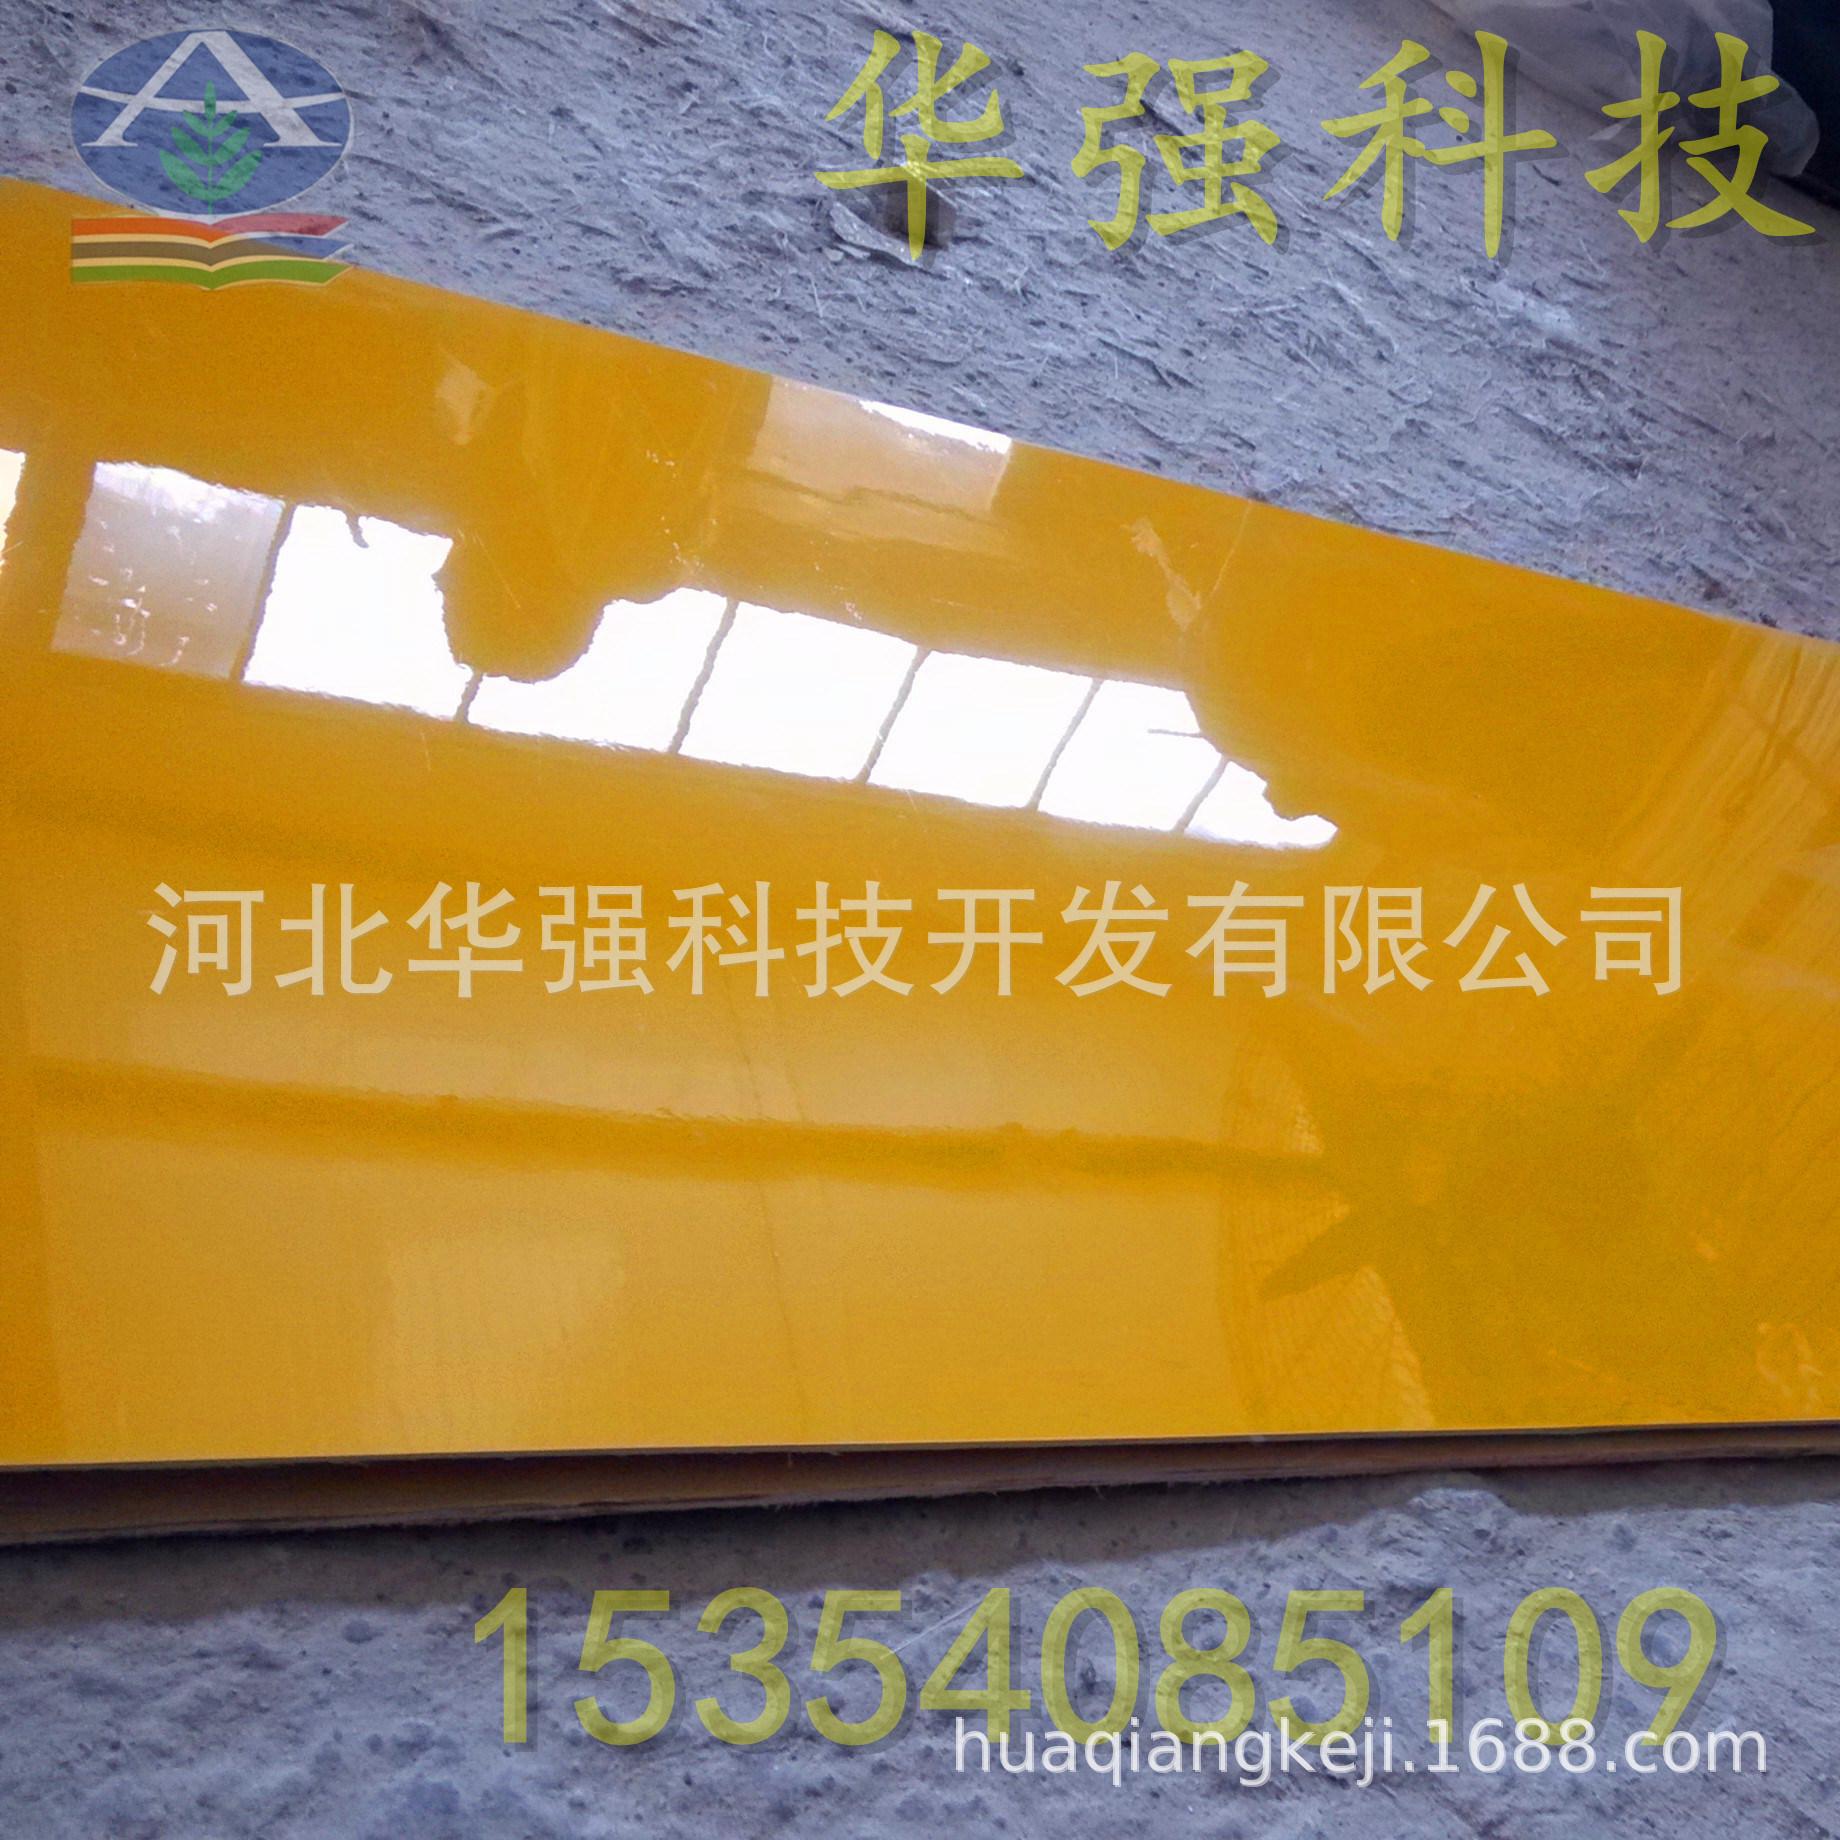 FRP玻璃钢板 耐腐蚀玻璃钢平面板 玻璃钢高温板子